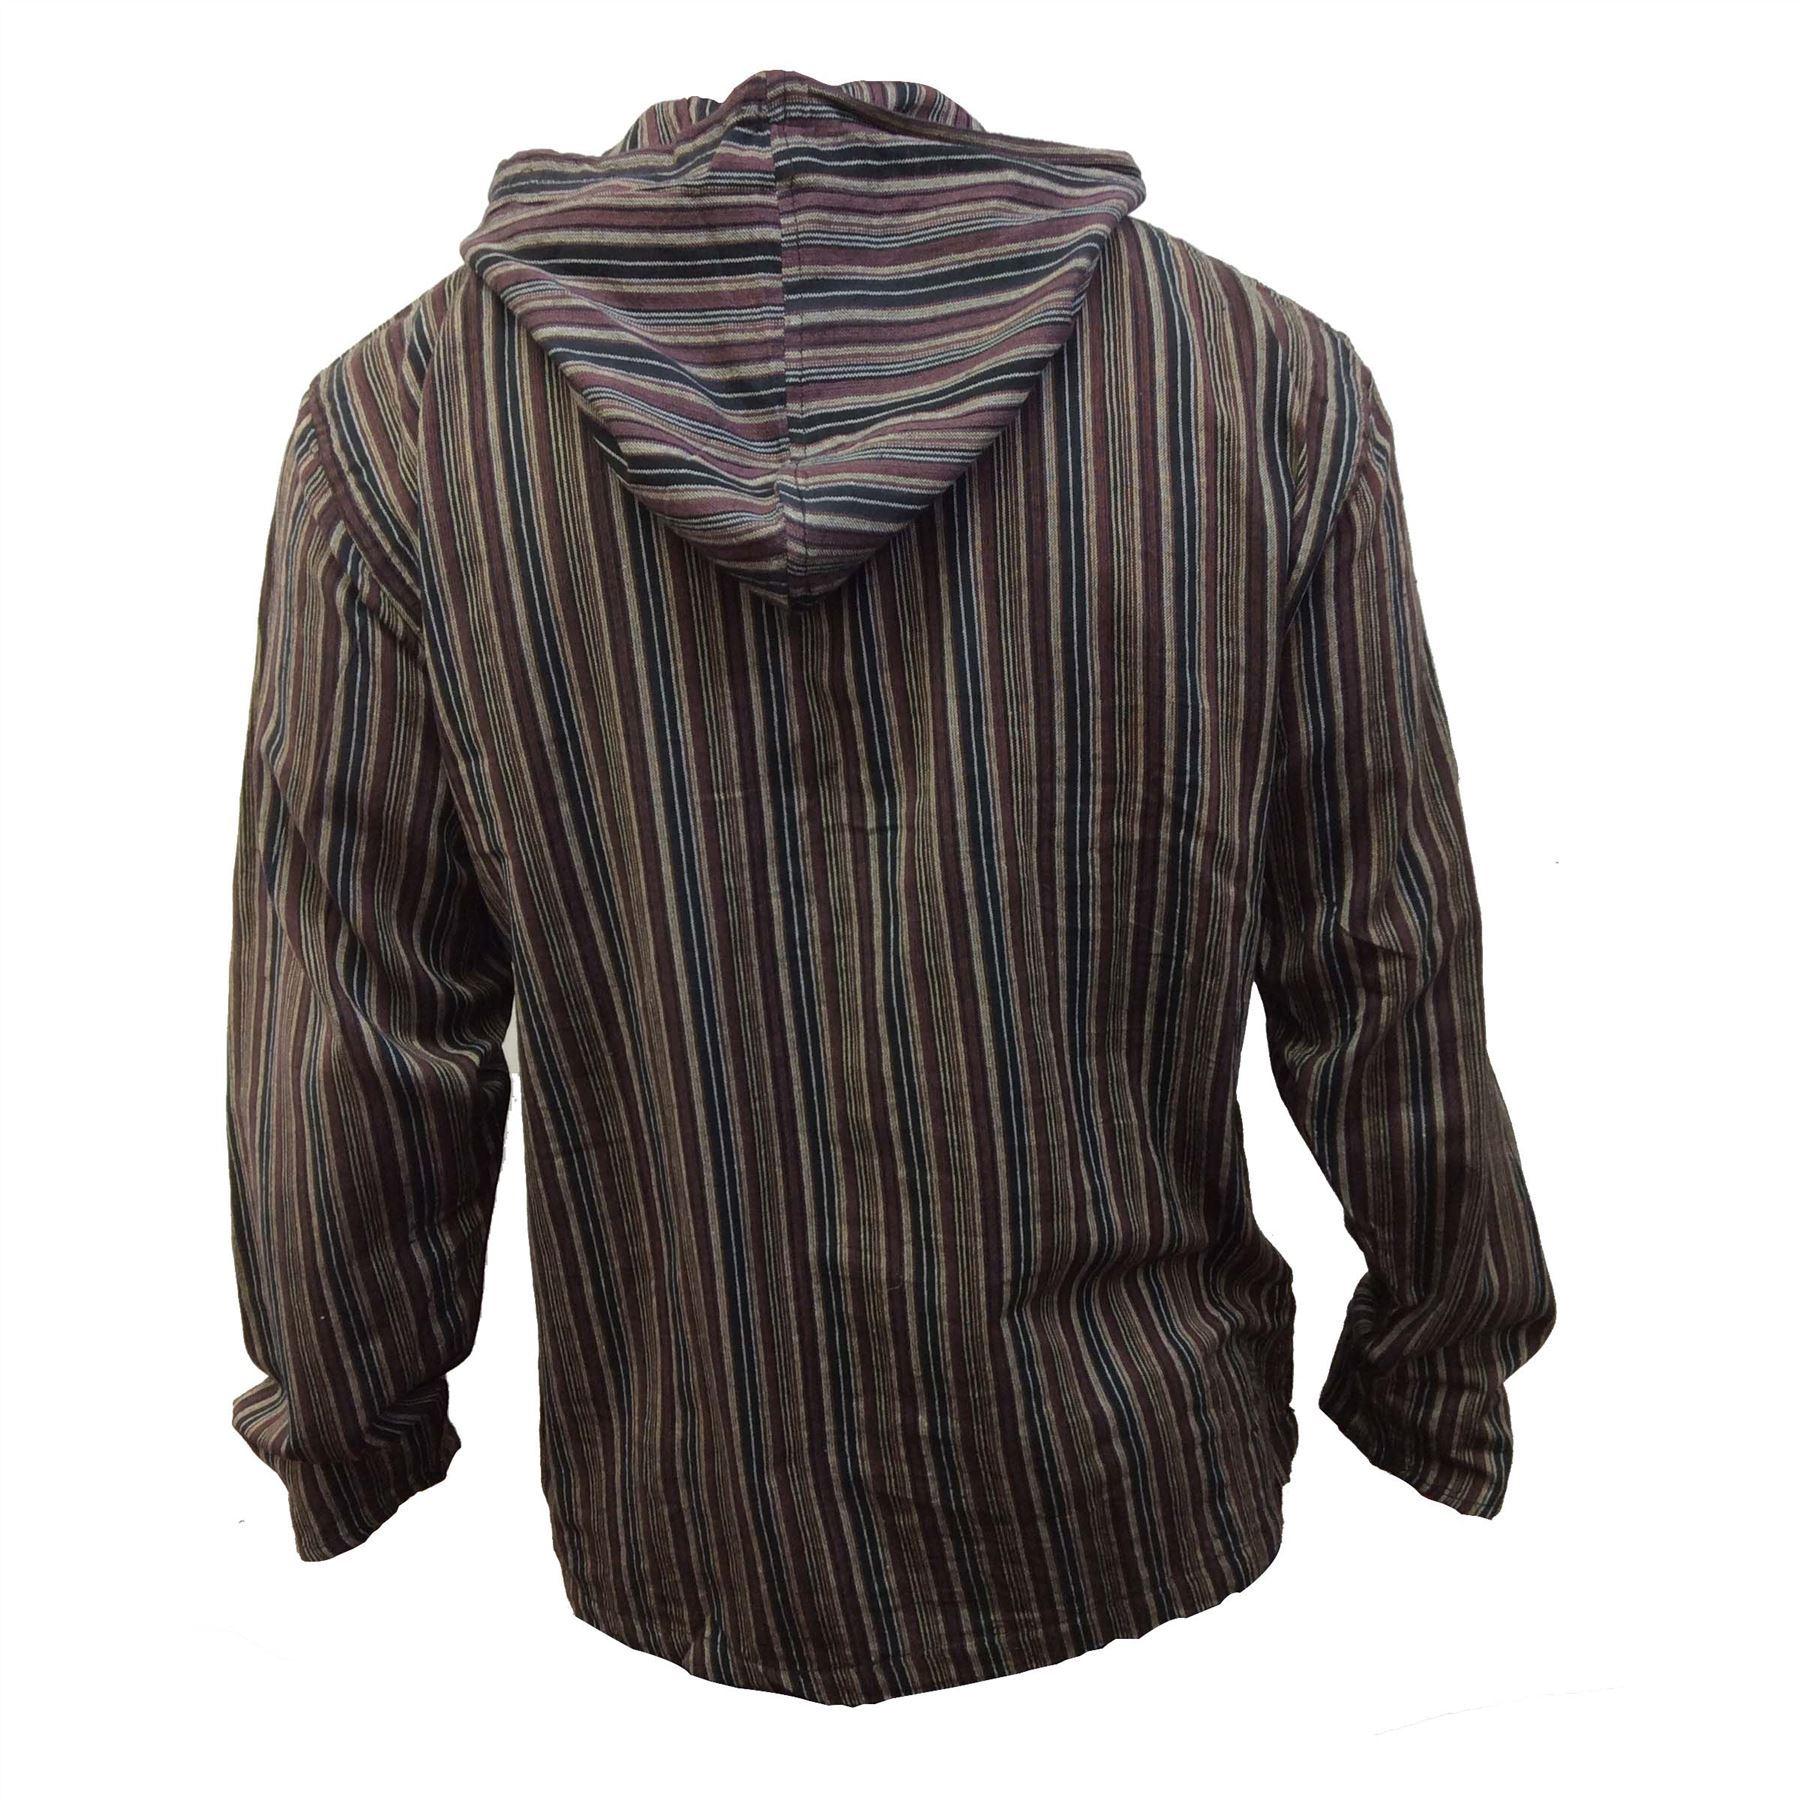 Men-039-s-Cotton-Grandad-Shirt-Full-Sleeved-Hippie-Top-Festival-Stripe-Hippy-Hoodie thumbnail 11